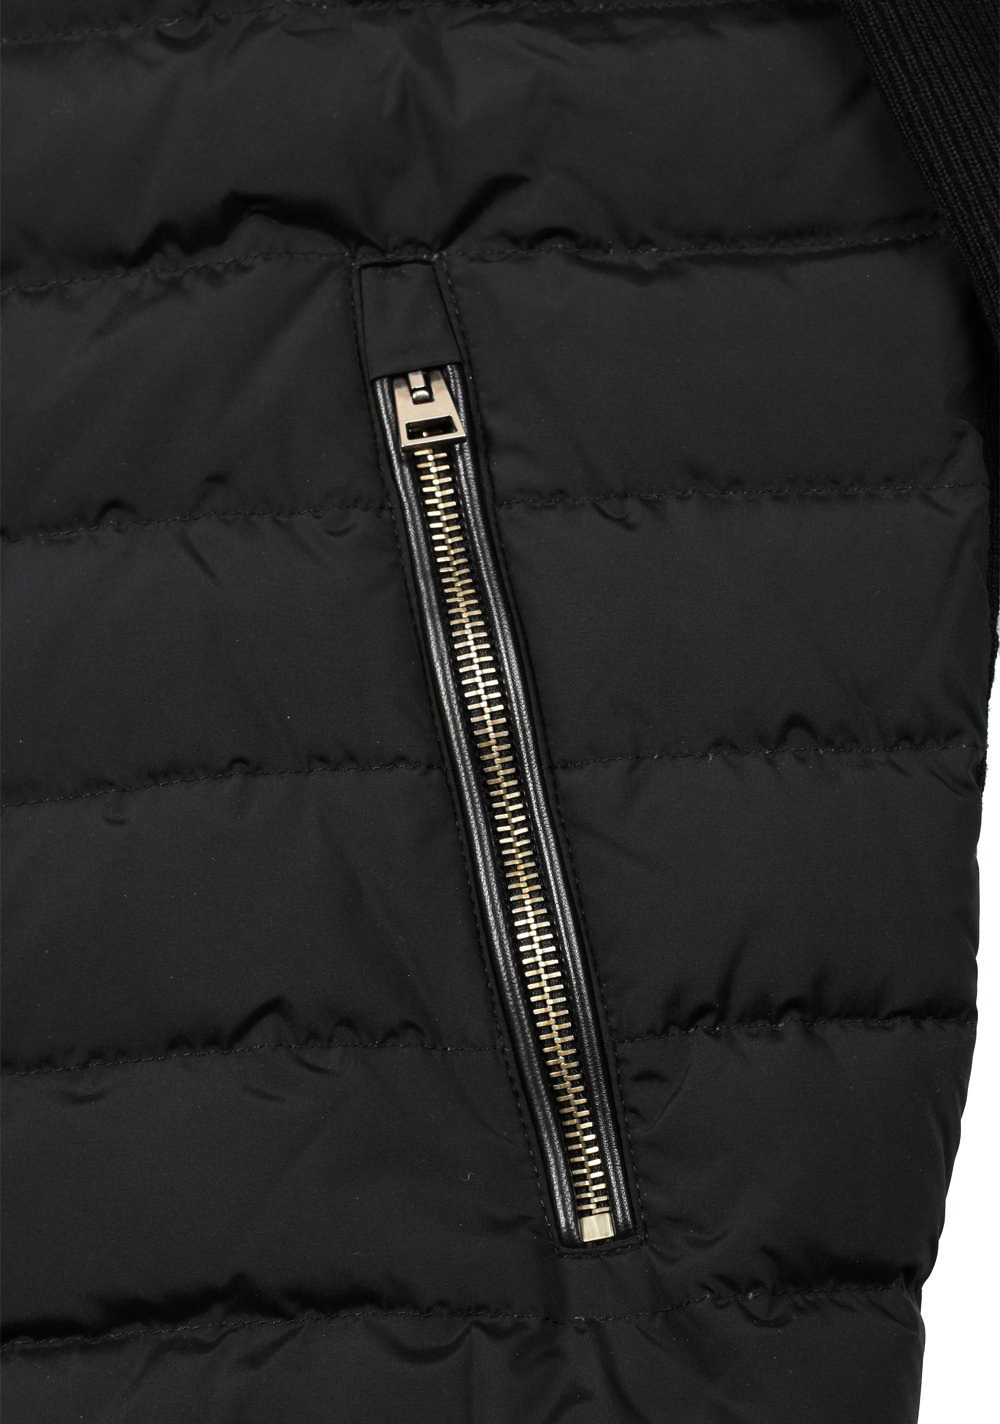 TOM FORD Black James Bond Spectre Knitted Sleeve Bomber Jacket  Size 48 / 38R U.S. | Costume Limité